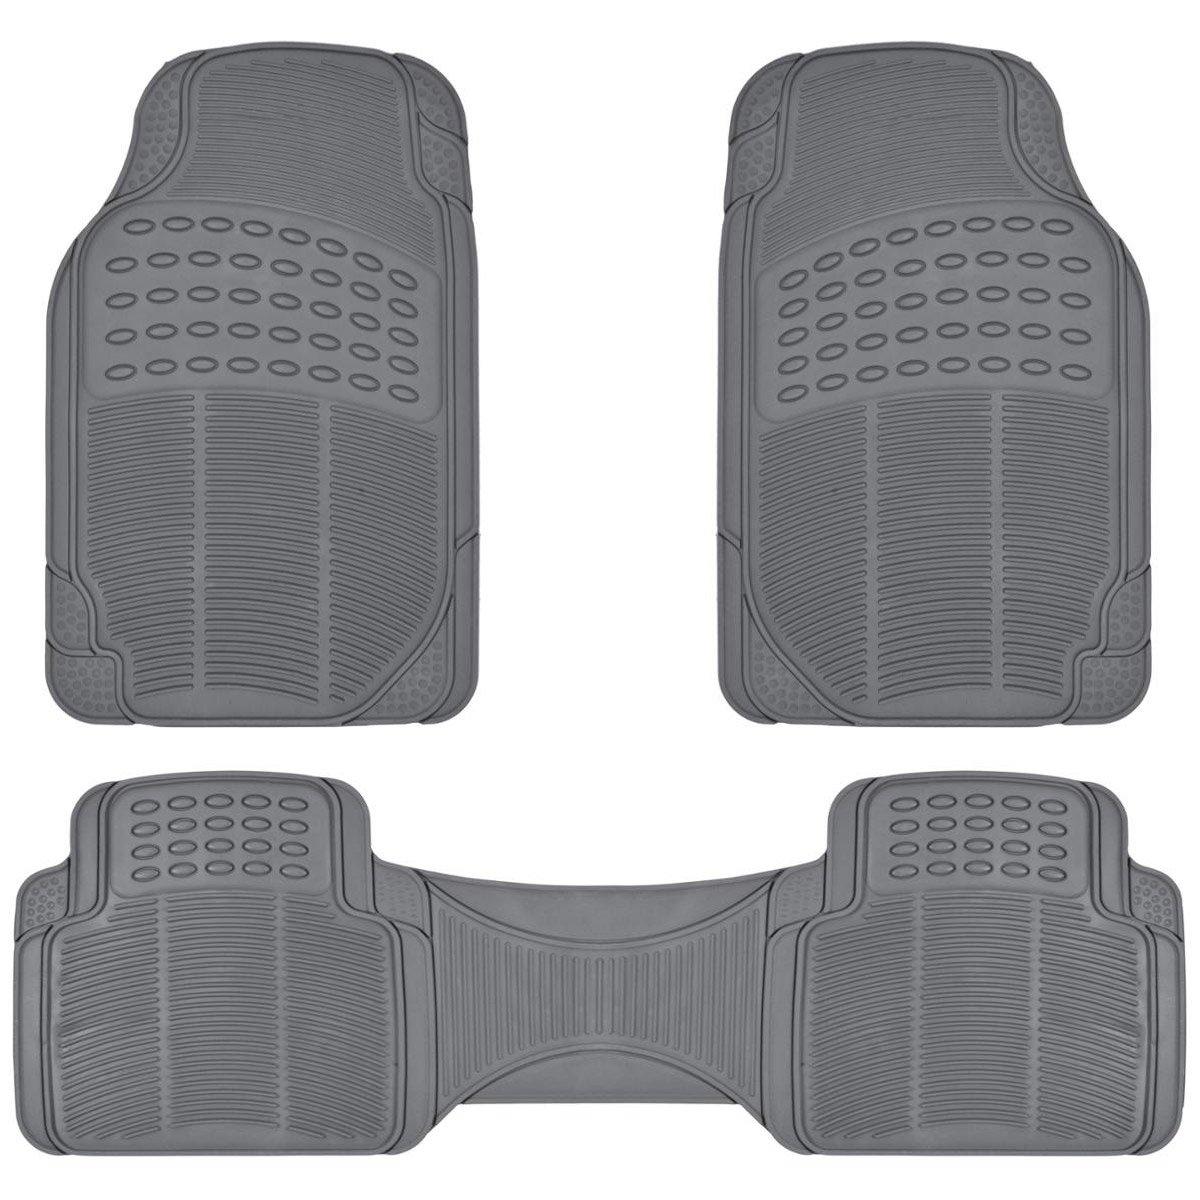 Rubber floor mats minivan - Amazon Com Proliner Gray All Weather Rubber Auto Floor Mats Liner Heavy Duty 3pc Set Automotive